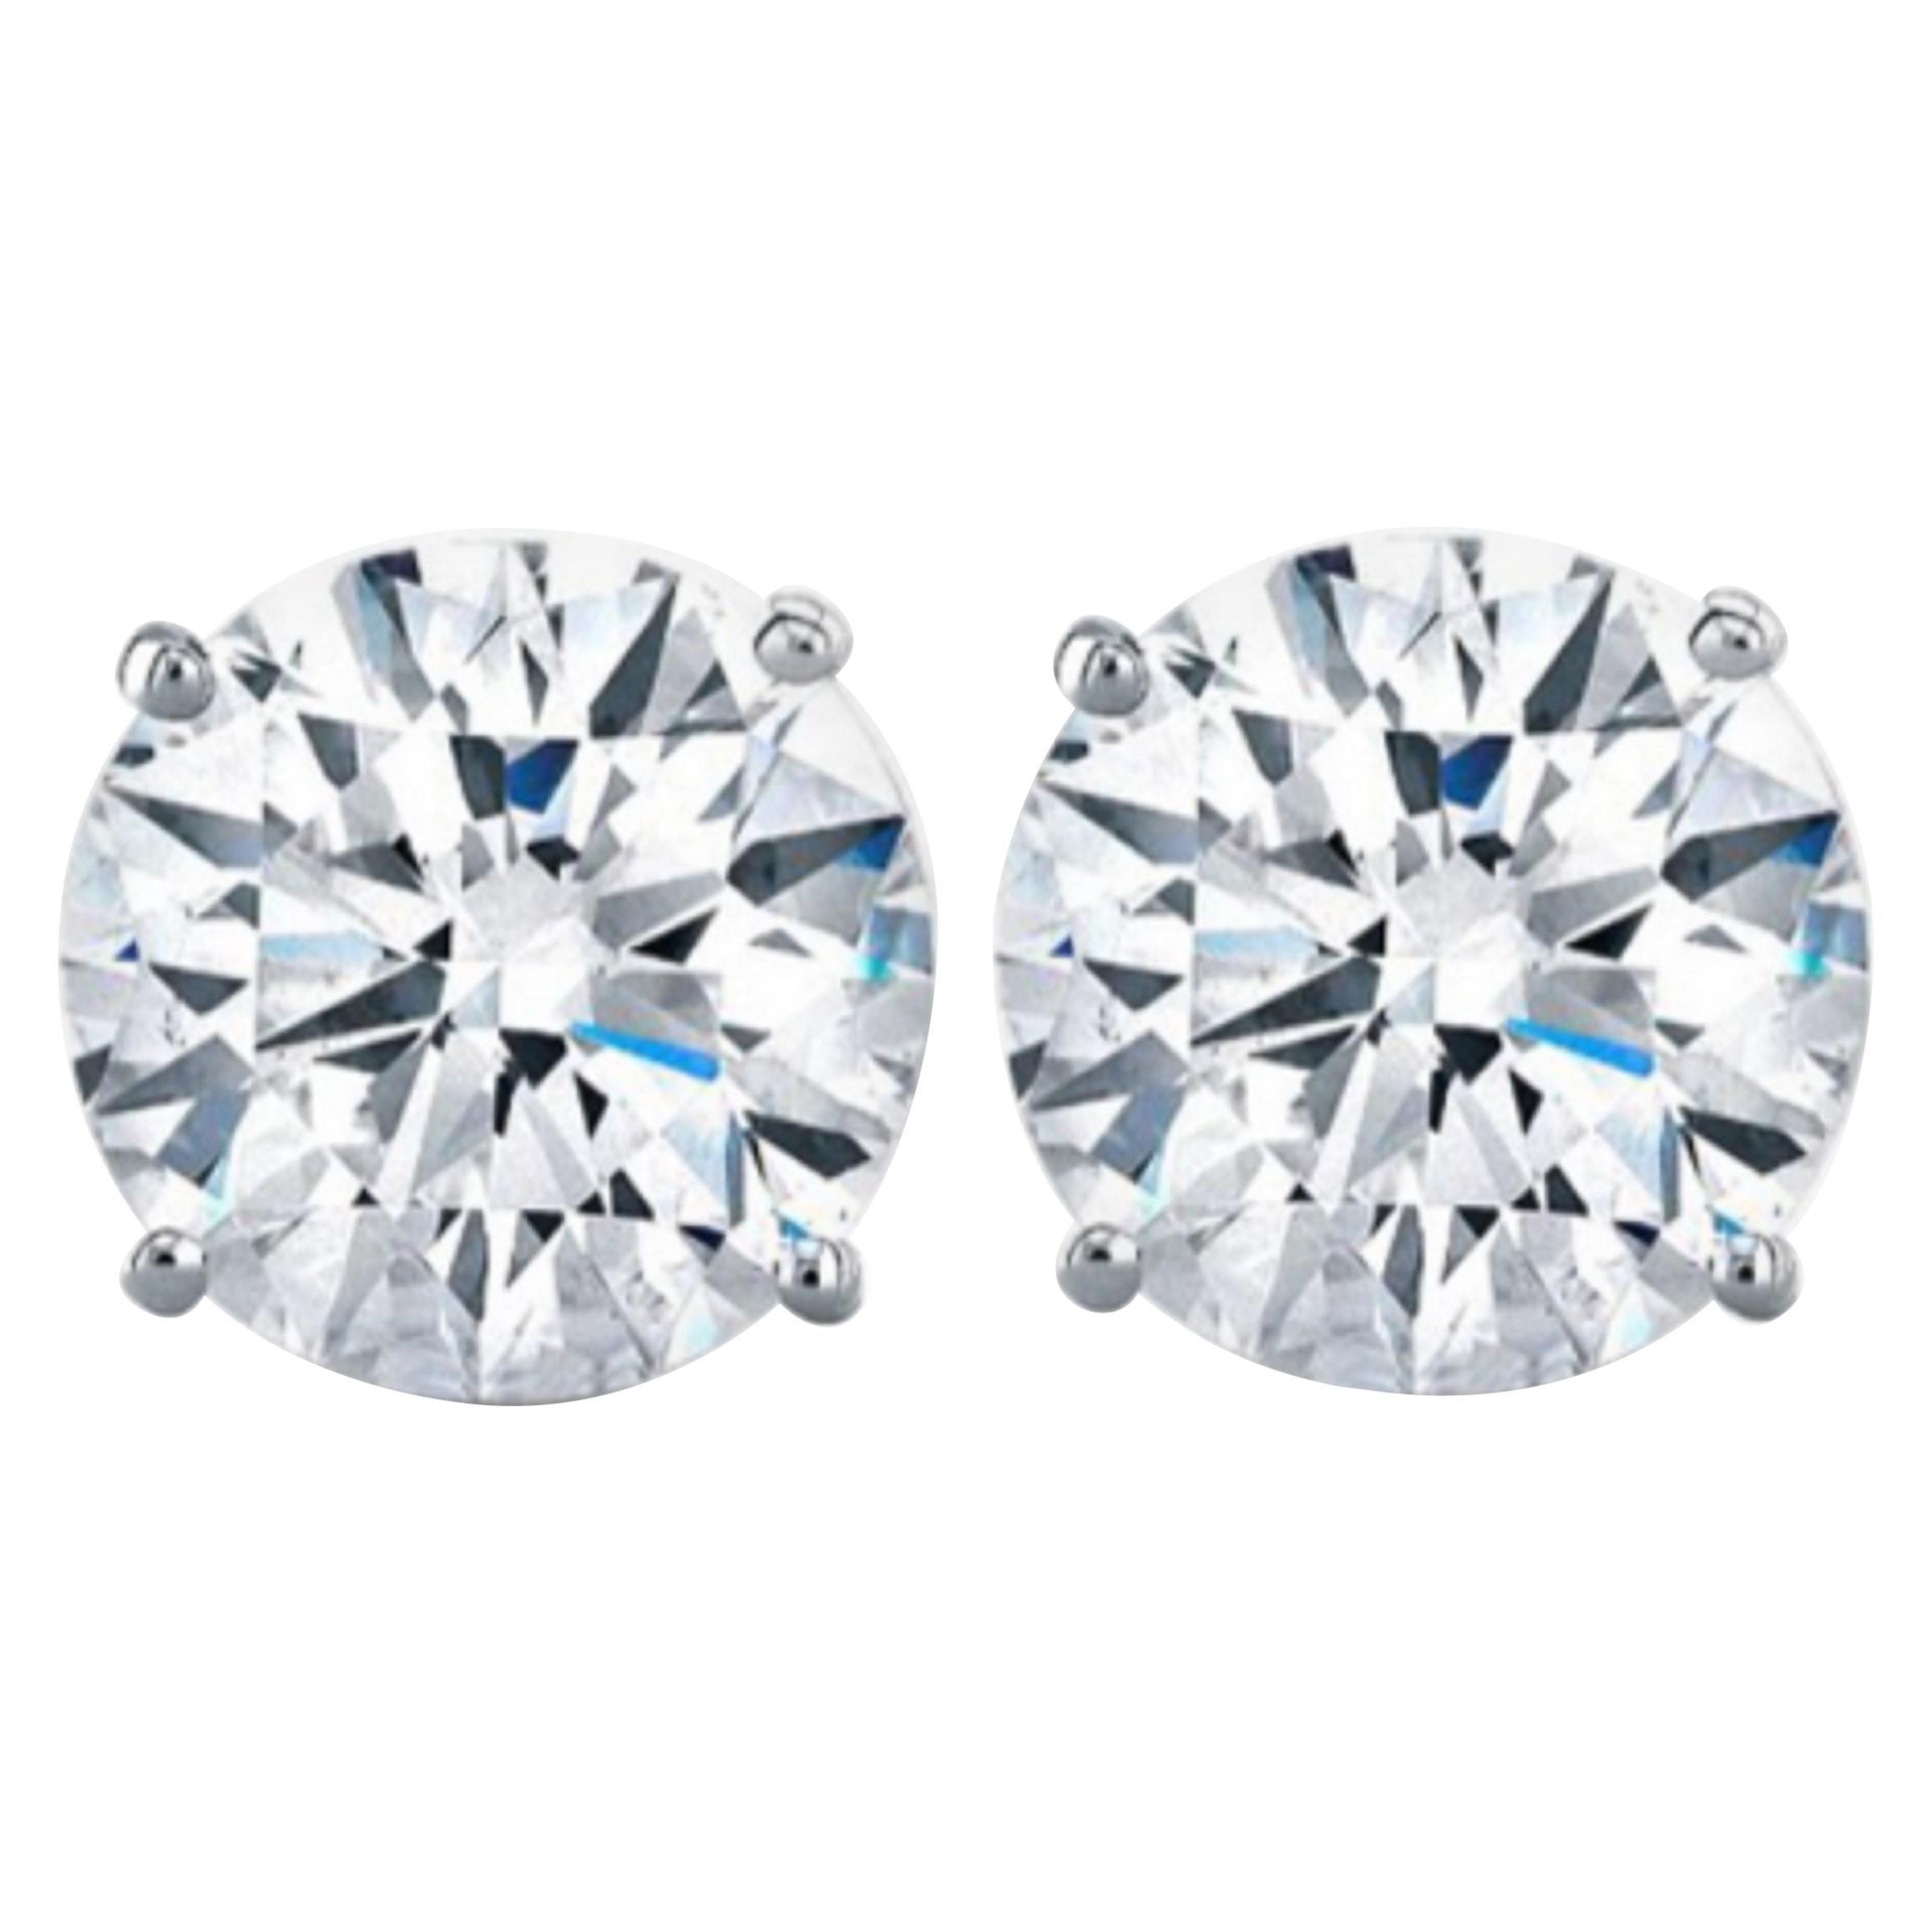 GIA Certified 6.02 Carat VVS1/SI1 Clarity H Color Diamond Studs